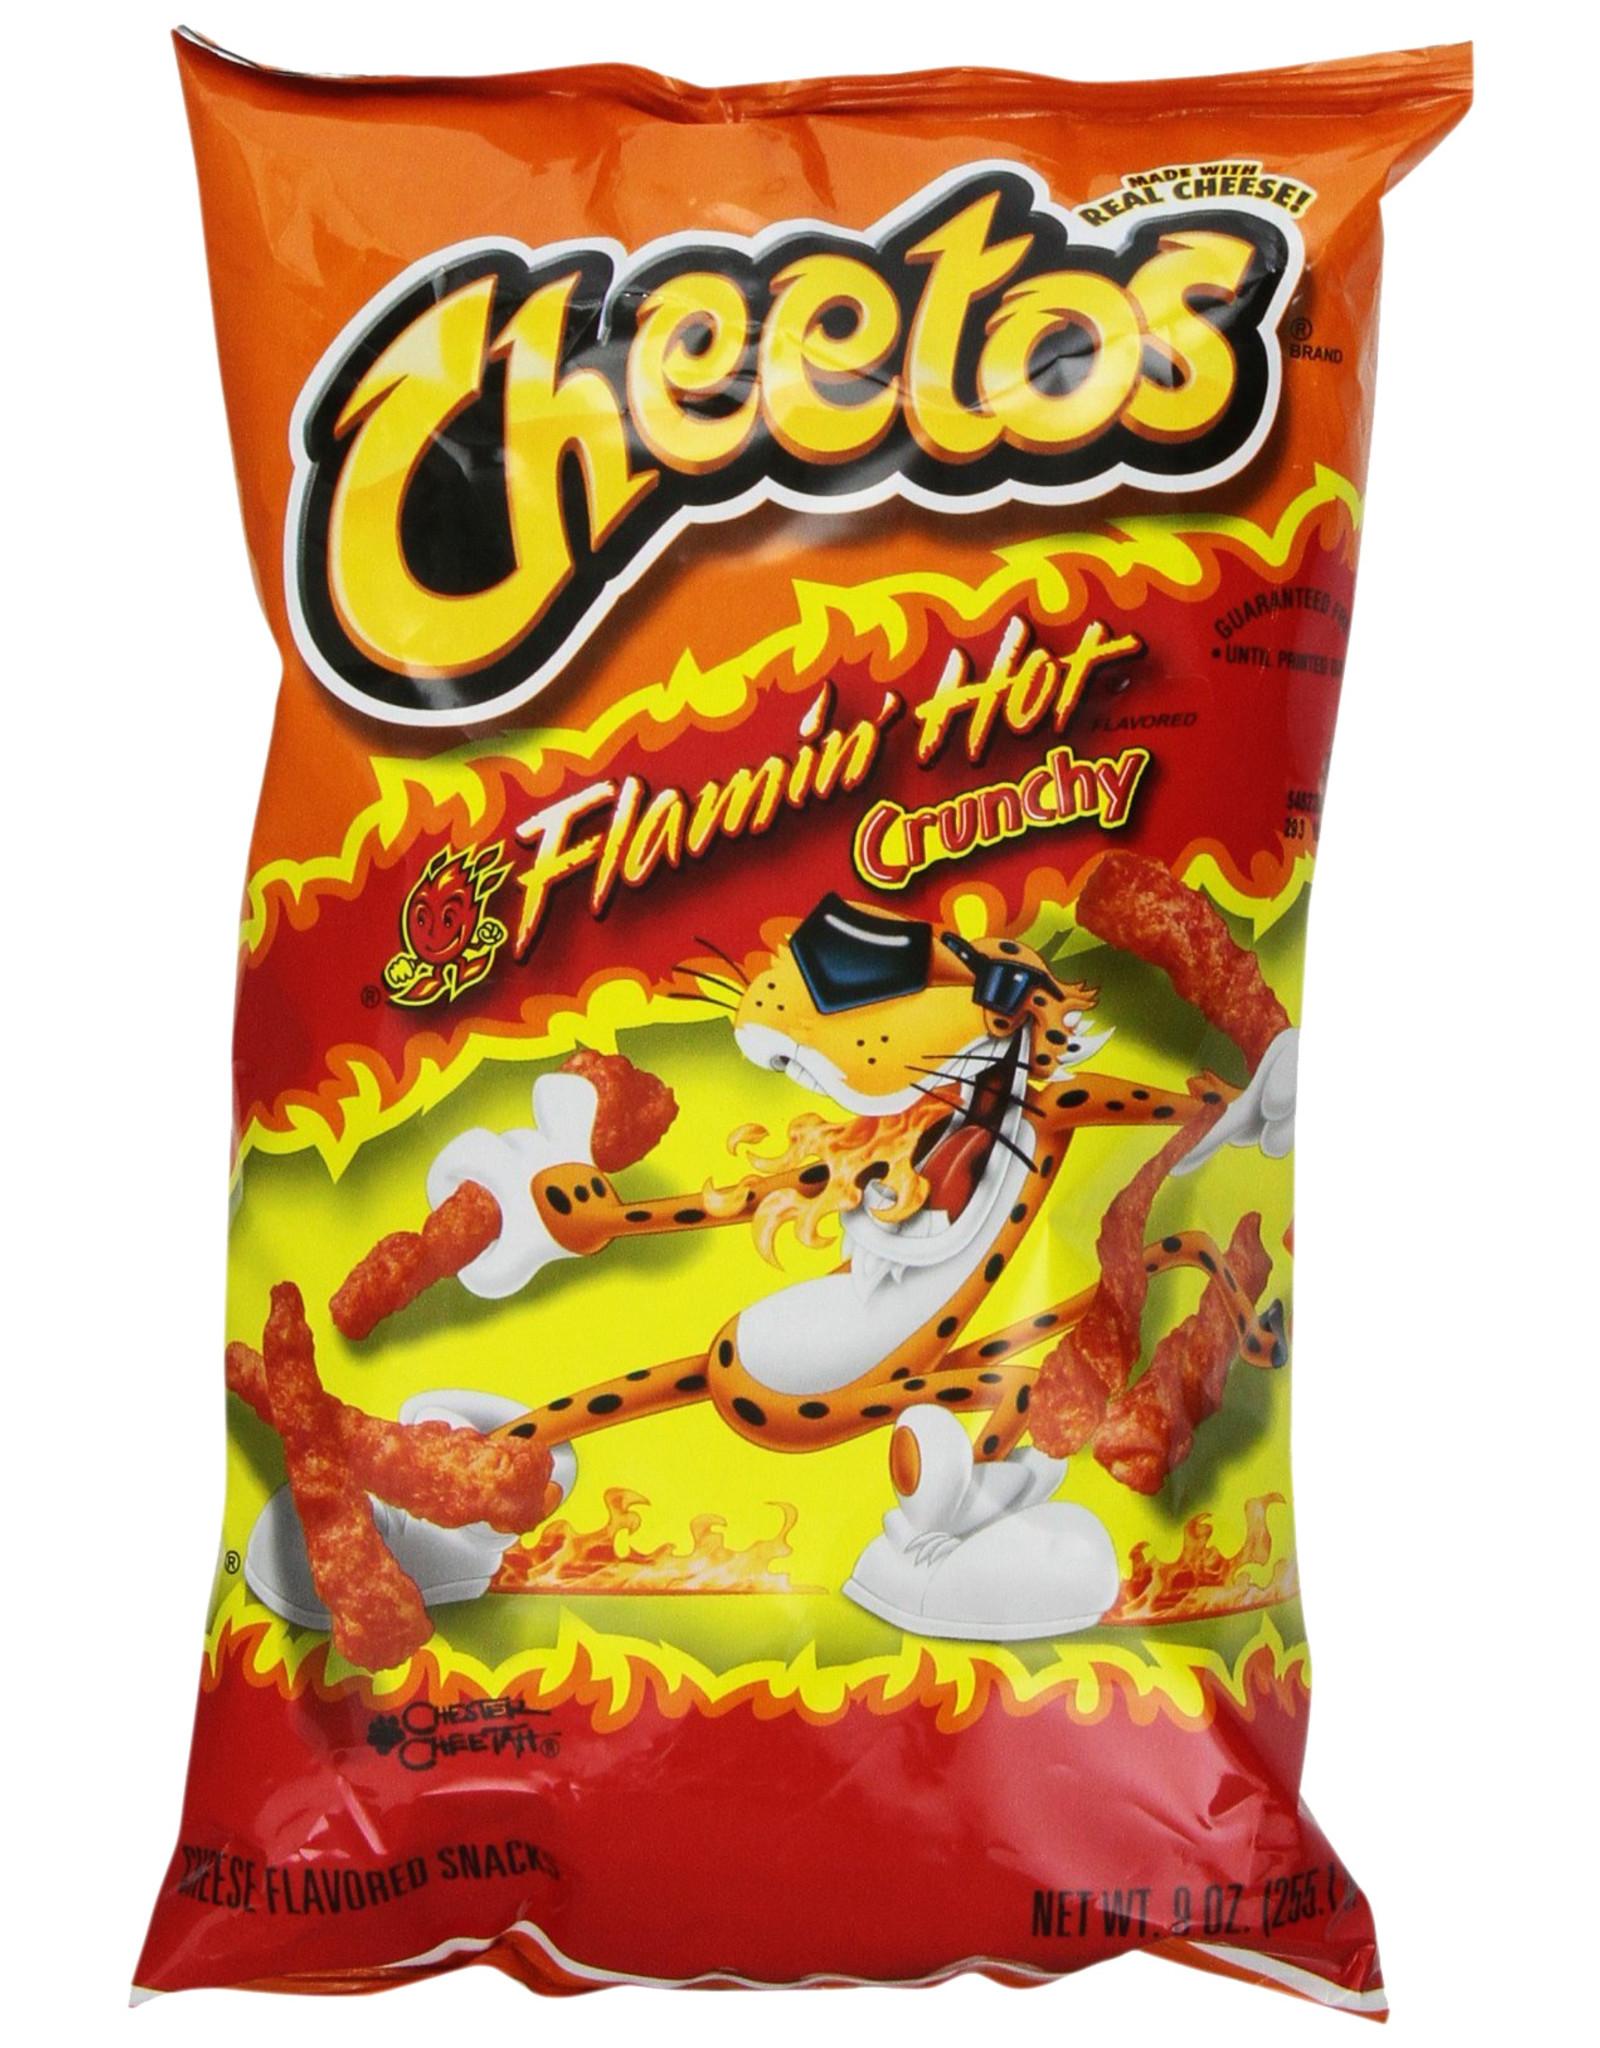 Cheetos Crunchy Flamin' Hot - Large - 226g